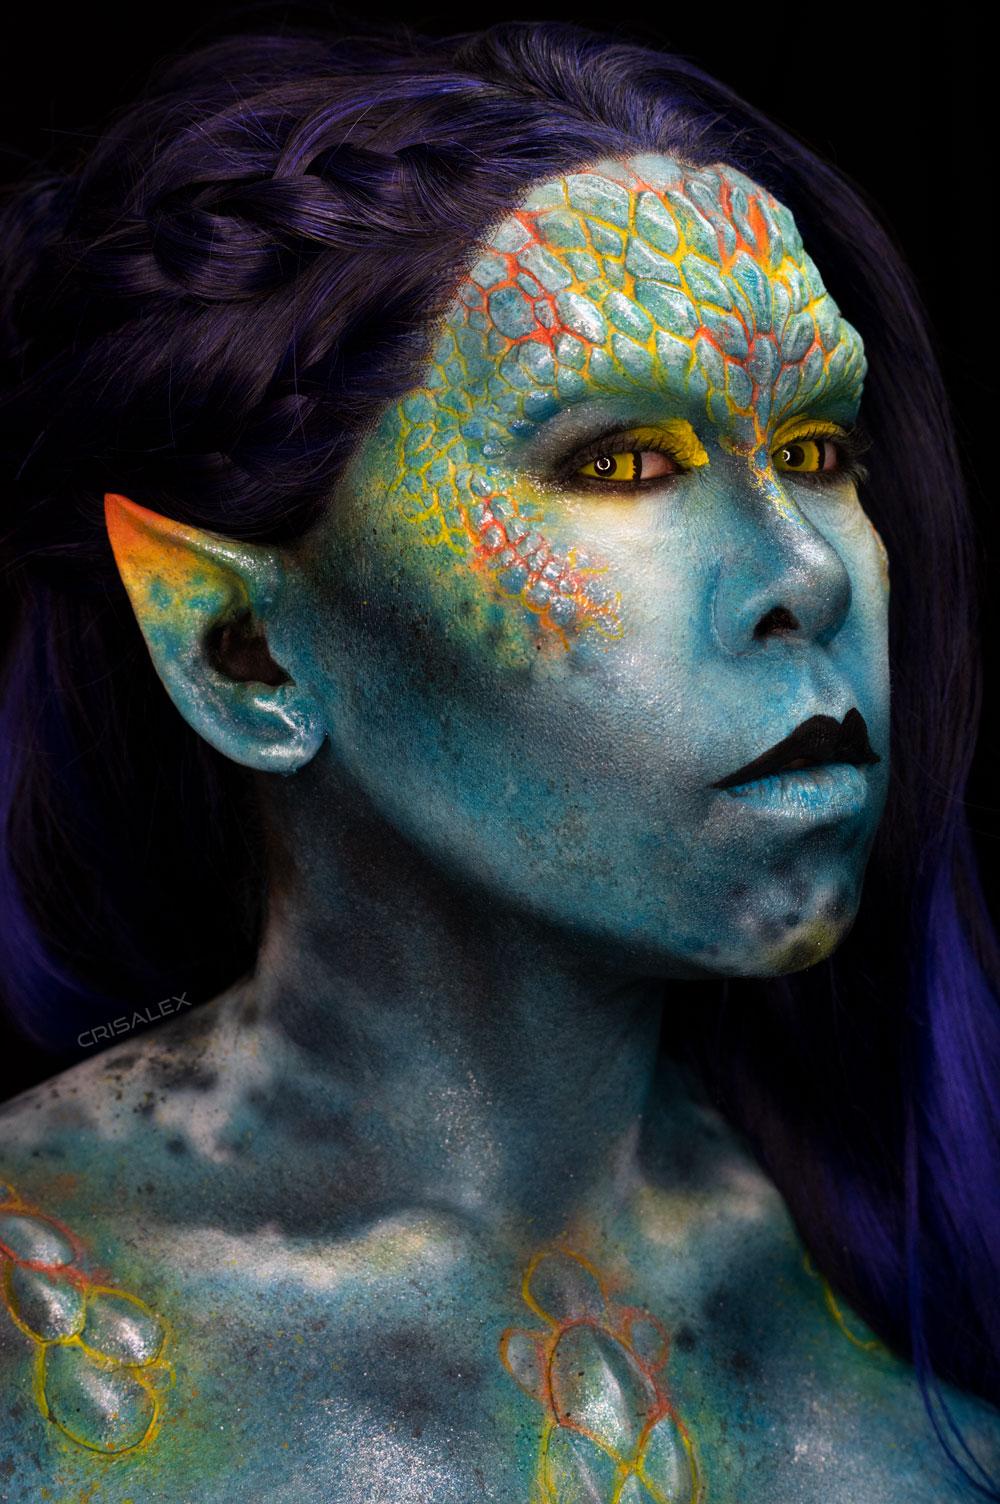 zale fx rbfx special effects makeup prosthetic alien mermaid body paint creature